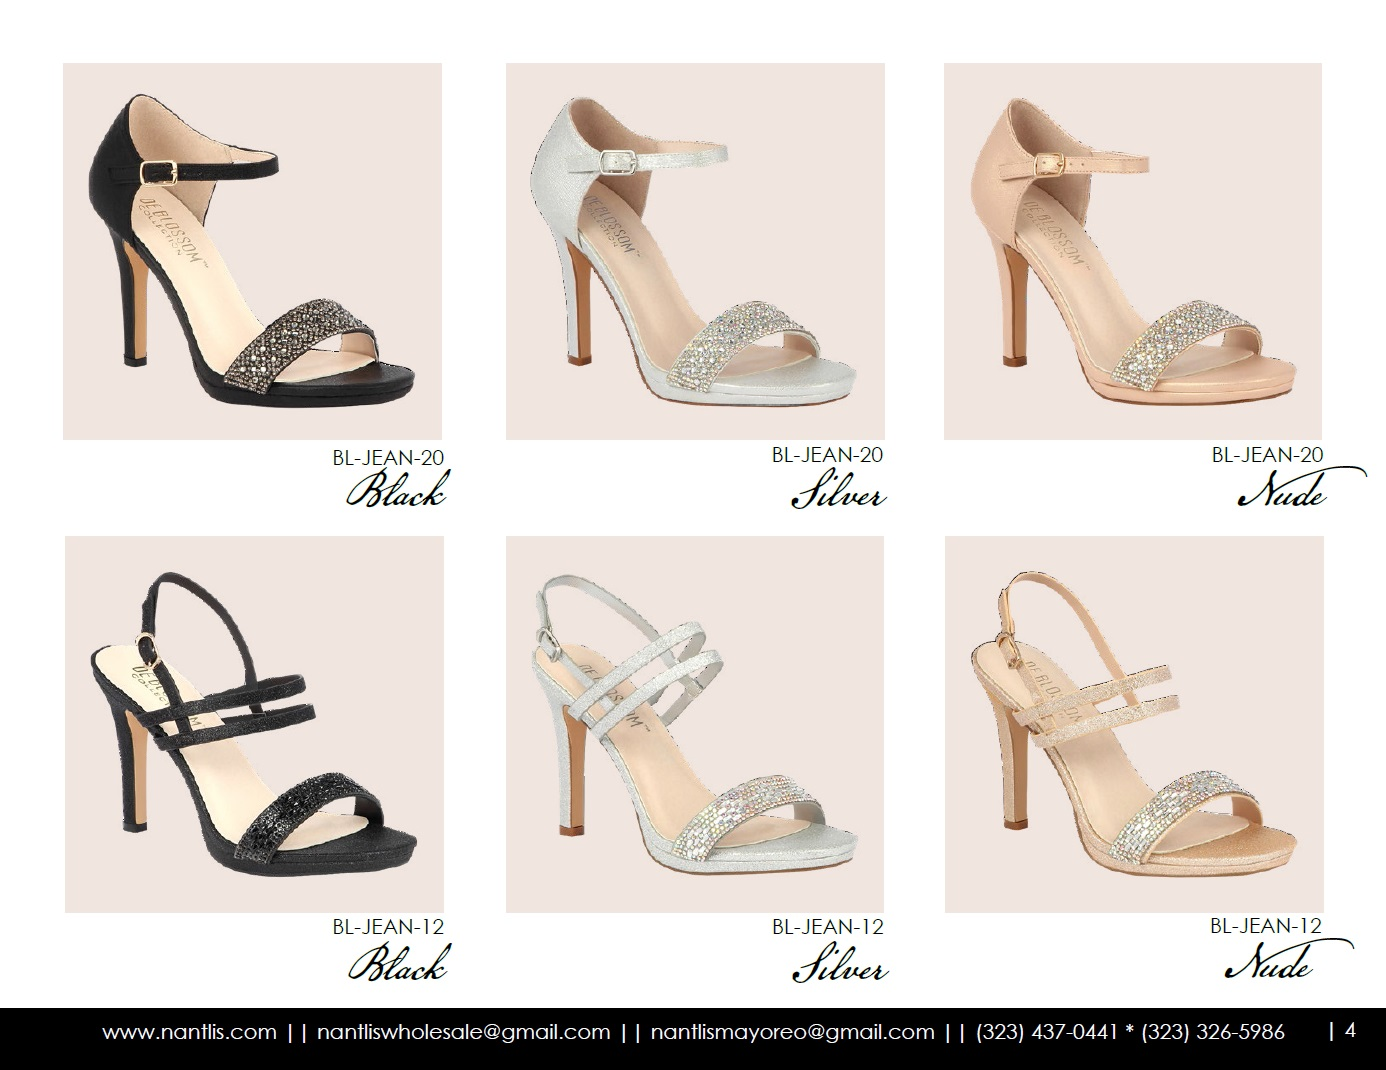 Nantlis Vol BL50 Zapatos de Mujer mayoreo Catalogo Wholesale womens Shoes_Page_04